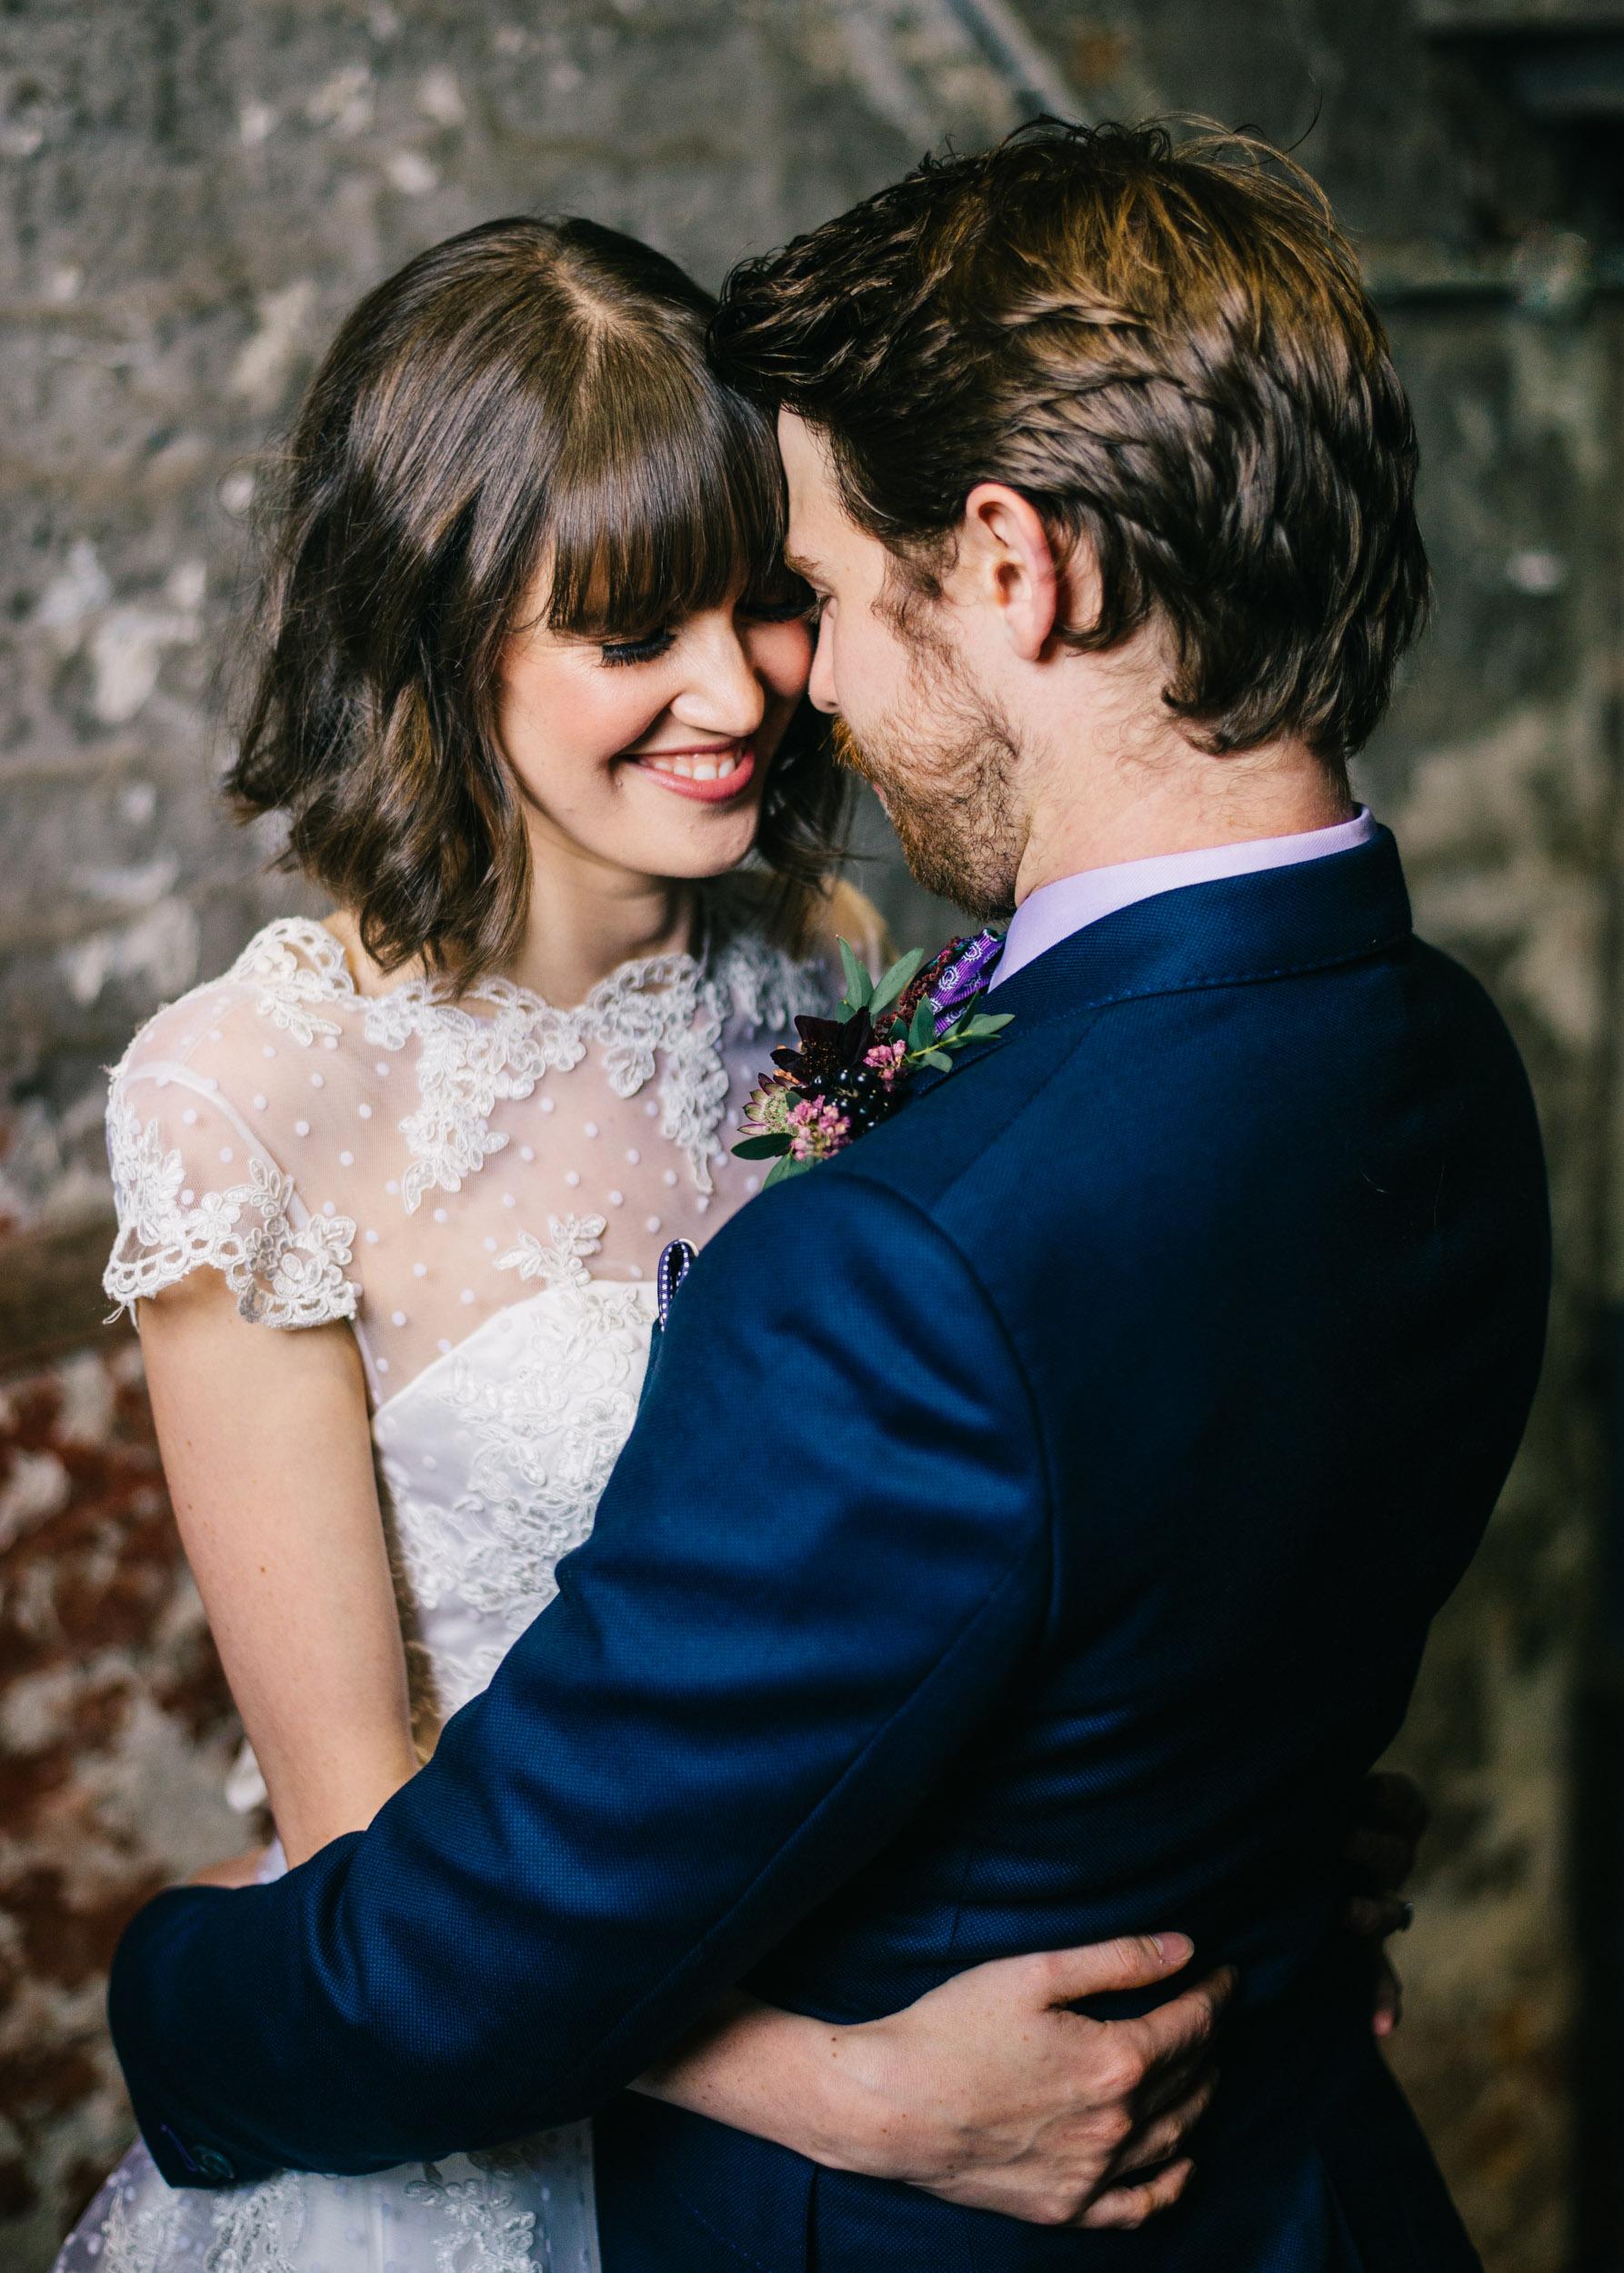 Holmes Mill, Clitheroe, Lancashire - Styled Wedding Shoot-40.jpg